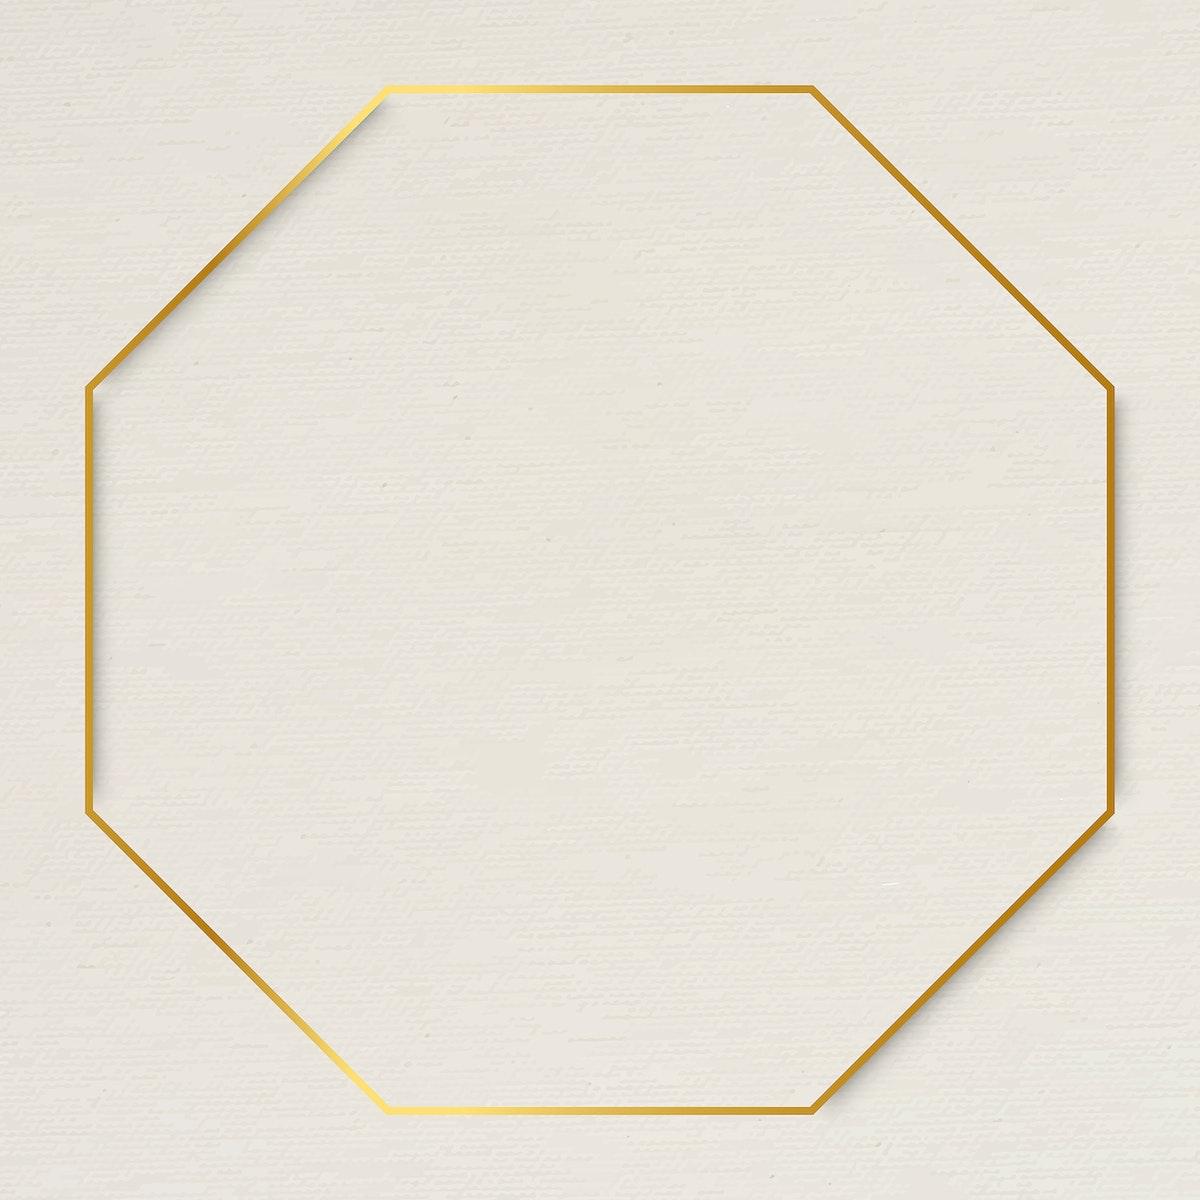 Octagon gold frame on beige background vector